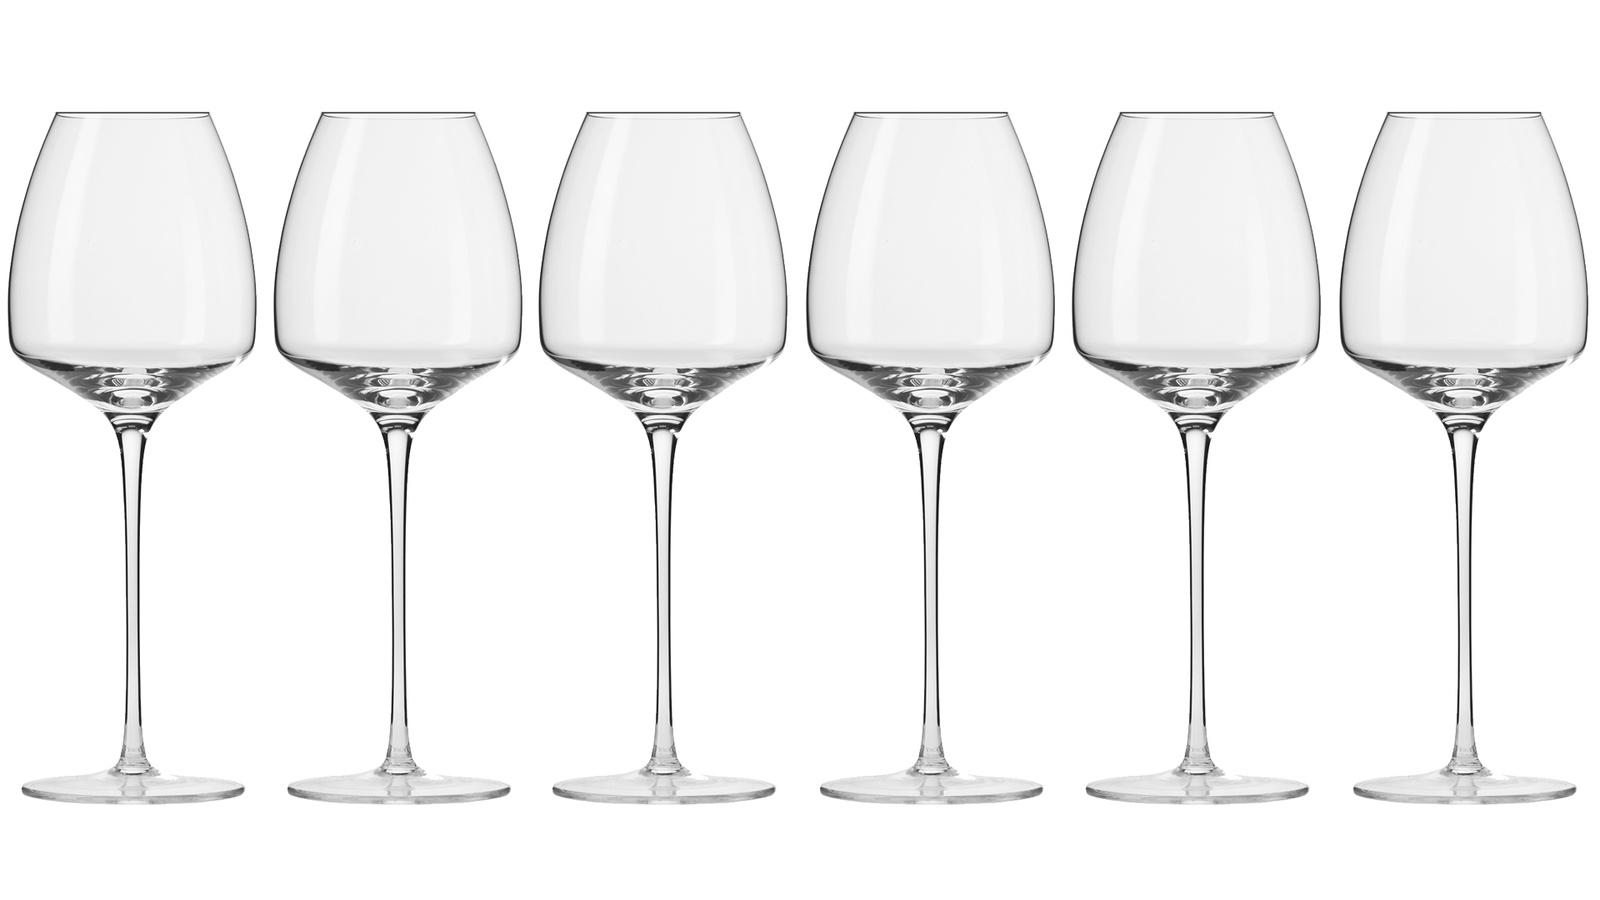 Бокал Krosno Бокалы для вина, прозрачный графин krosno